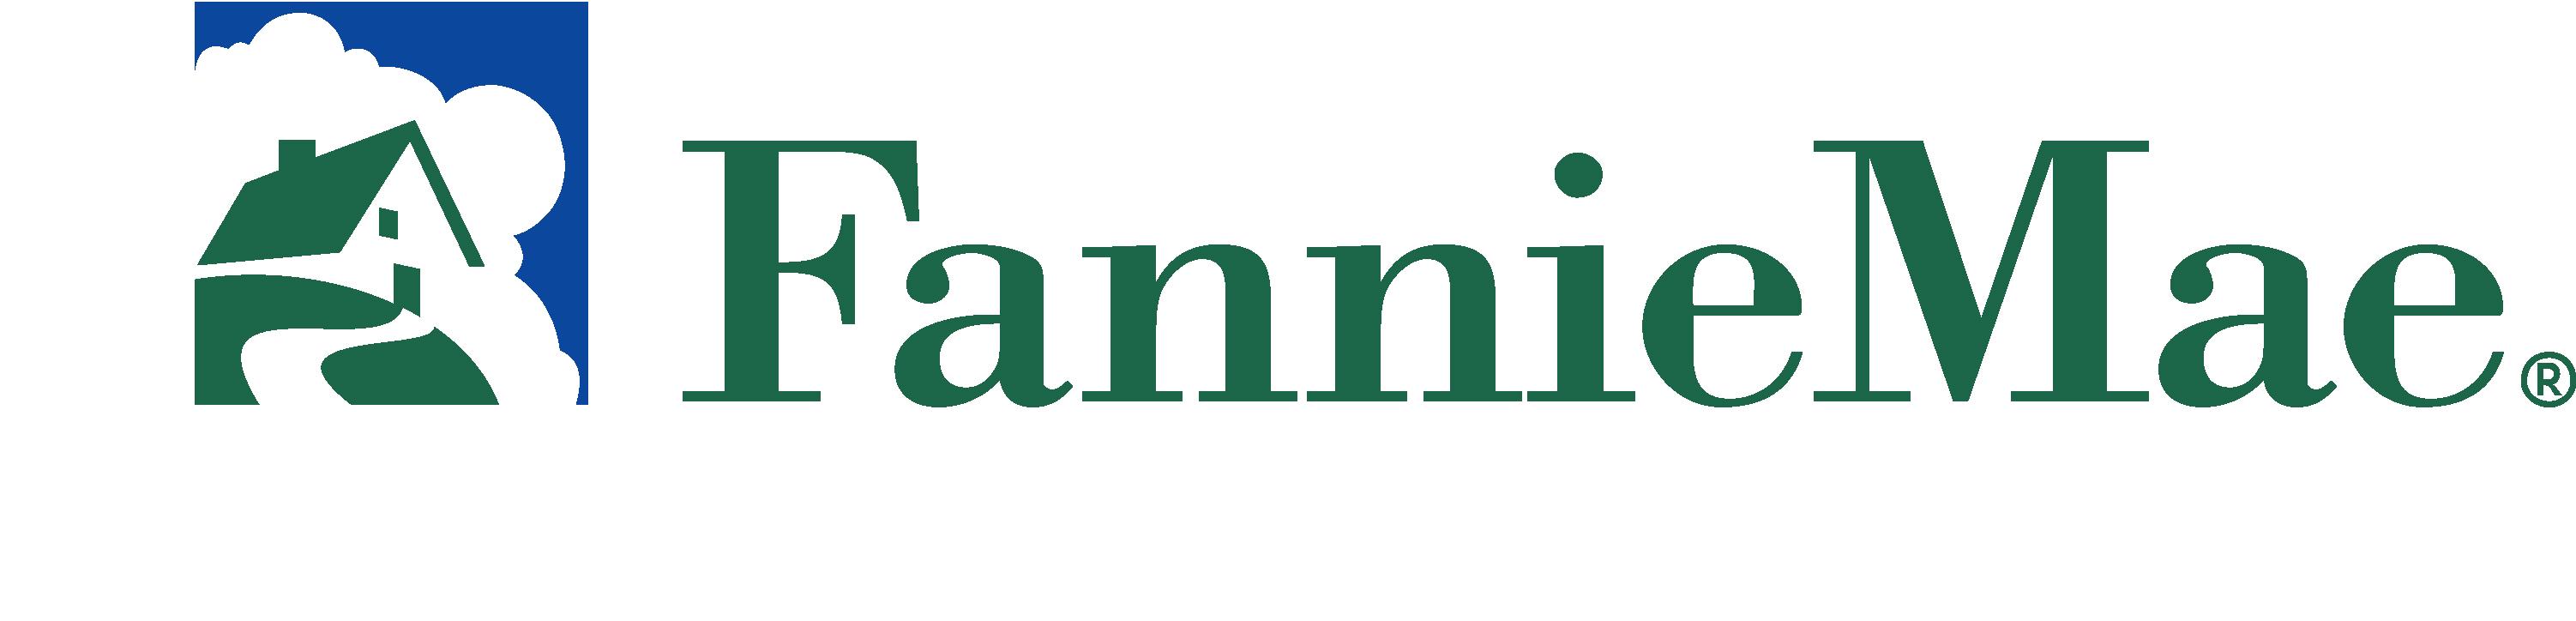 Fannie Mae Profit Points to Growing Housing Market